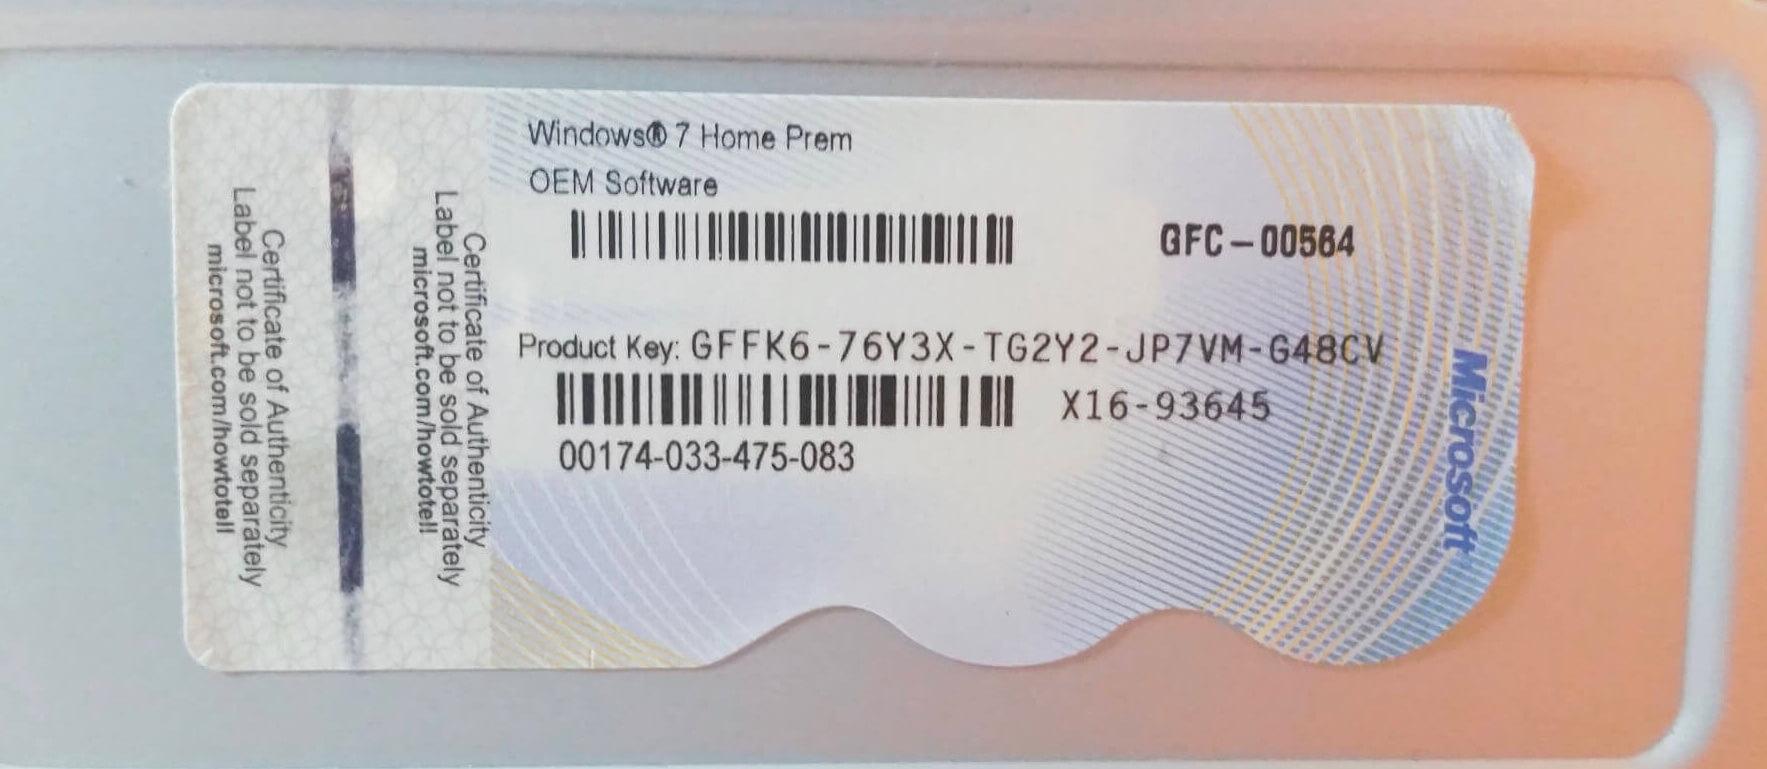 windows 7 product key in bios